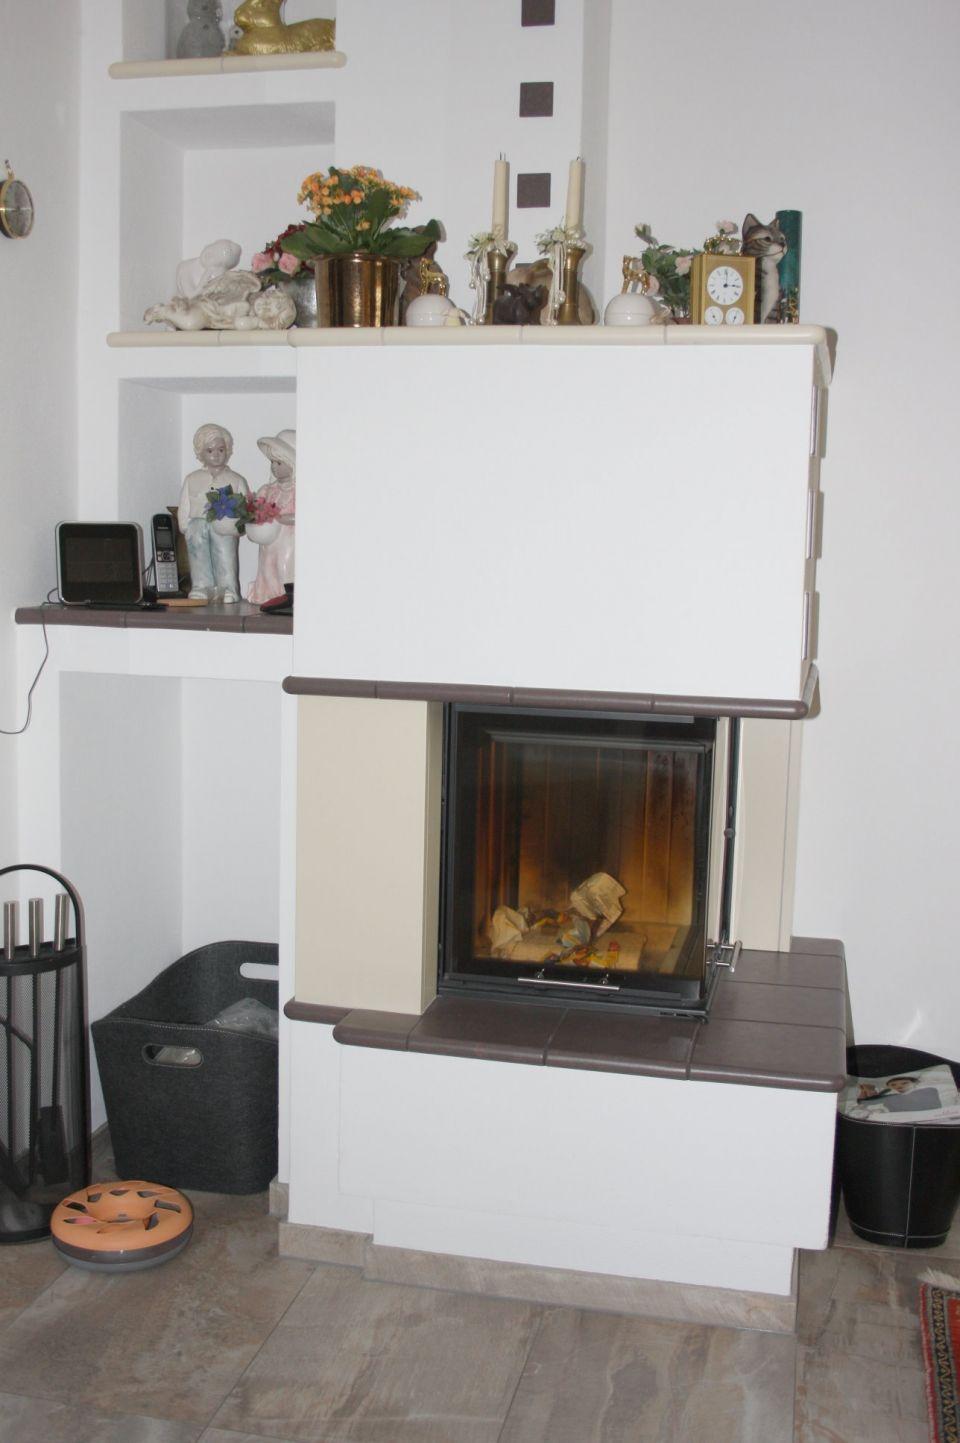 immobilien kirchham f lidl immo exklusive 4 zimmer. Black Bedroom Furniture Sets. Home Design Ideas